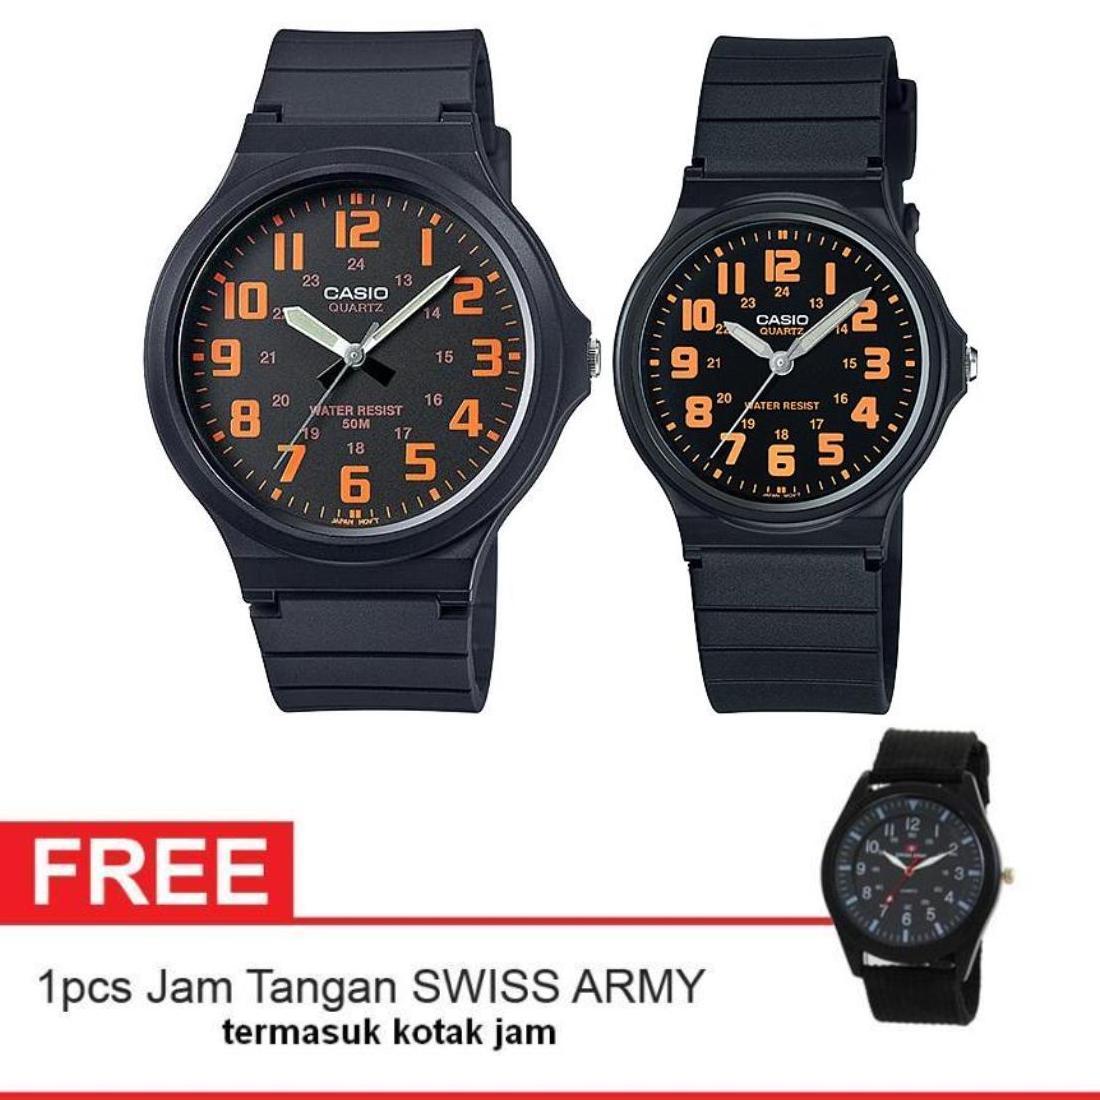 Promo Jam Tangan Cople Termurah 2018 Balmer B7922ml Couple Gold Harga Baru Casio Watch Putih Strap Karet Sporty